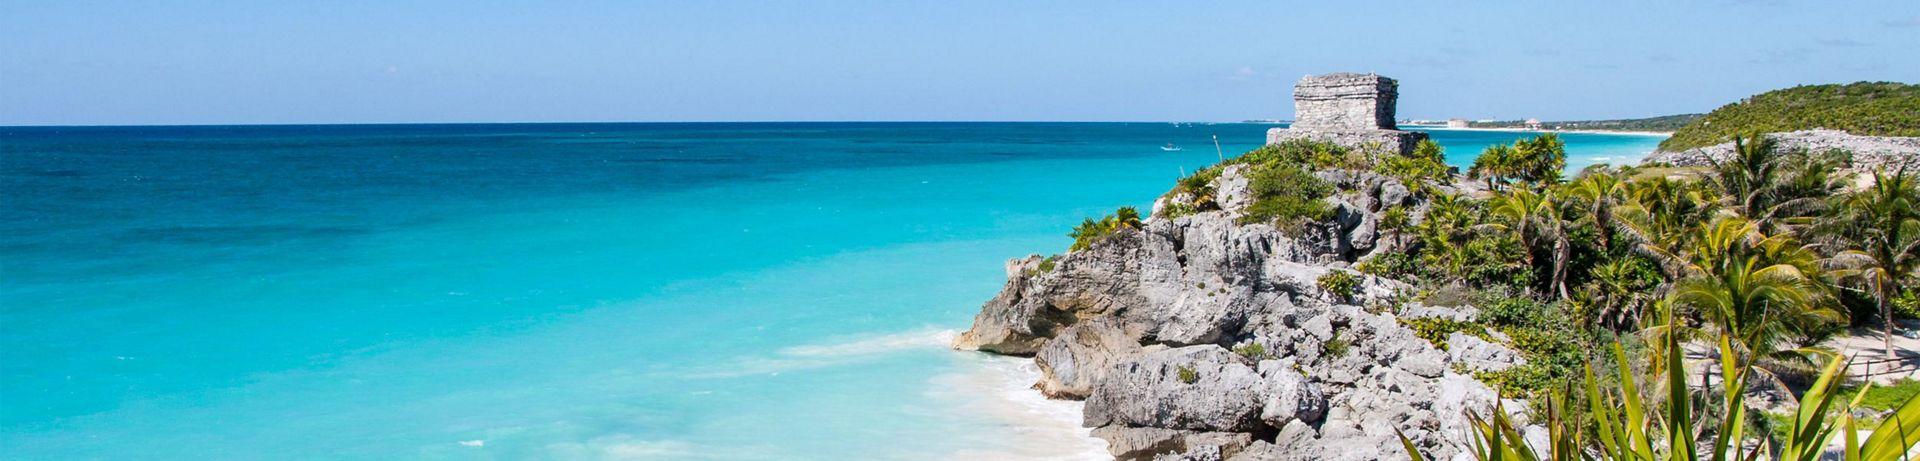 Silversea Luxury Cruises - Caribbean Offer